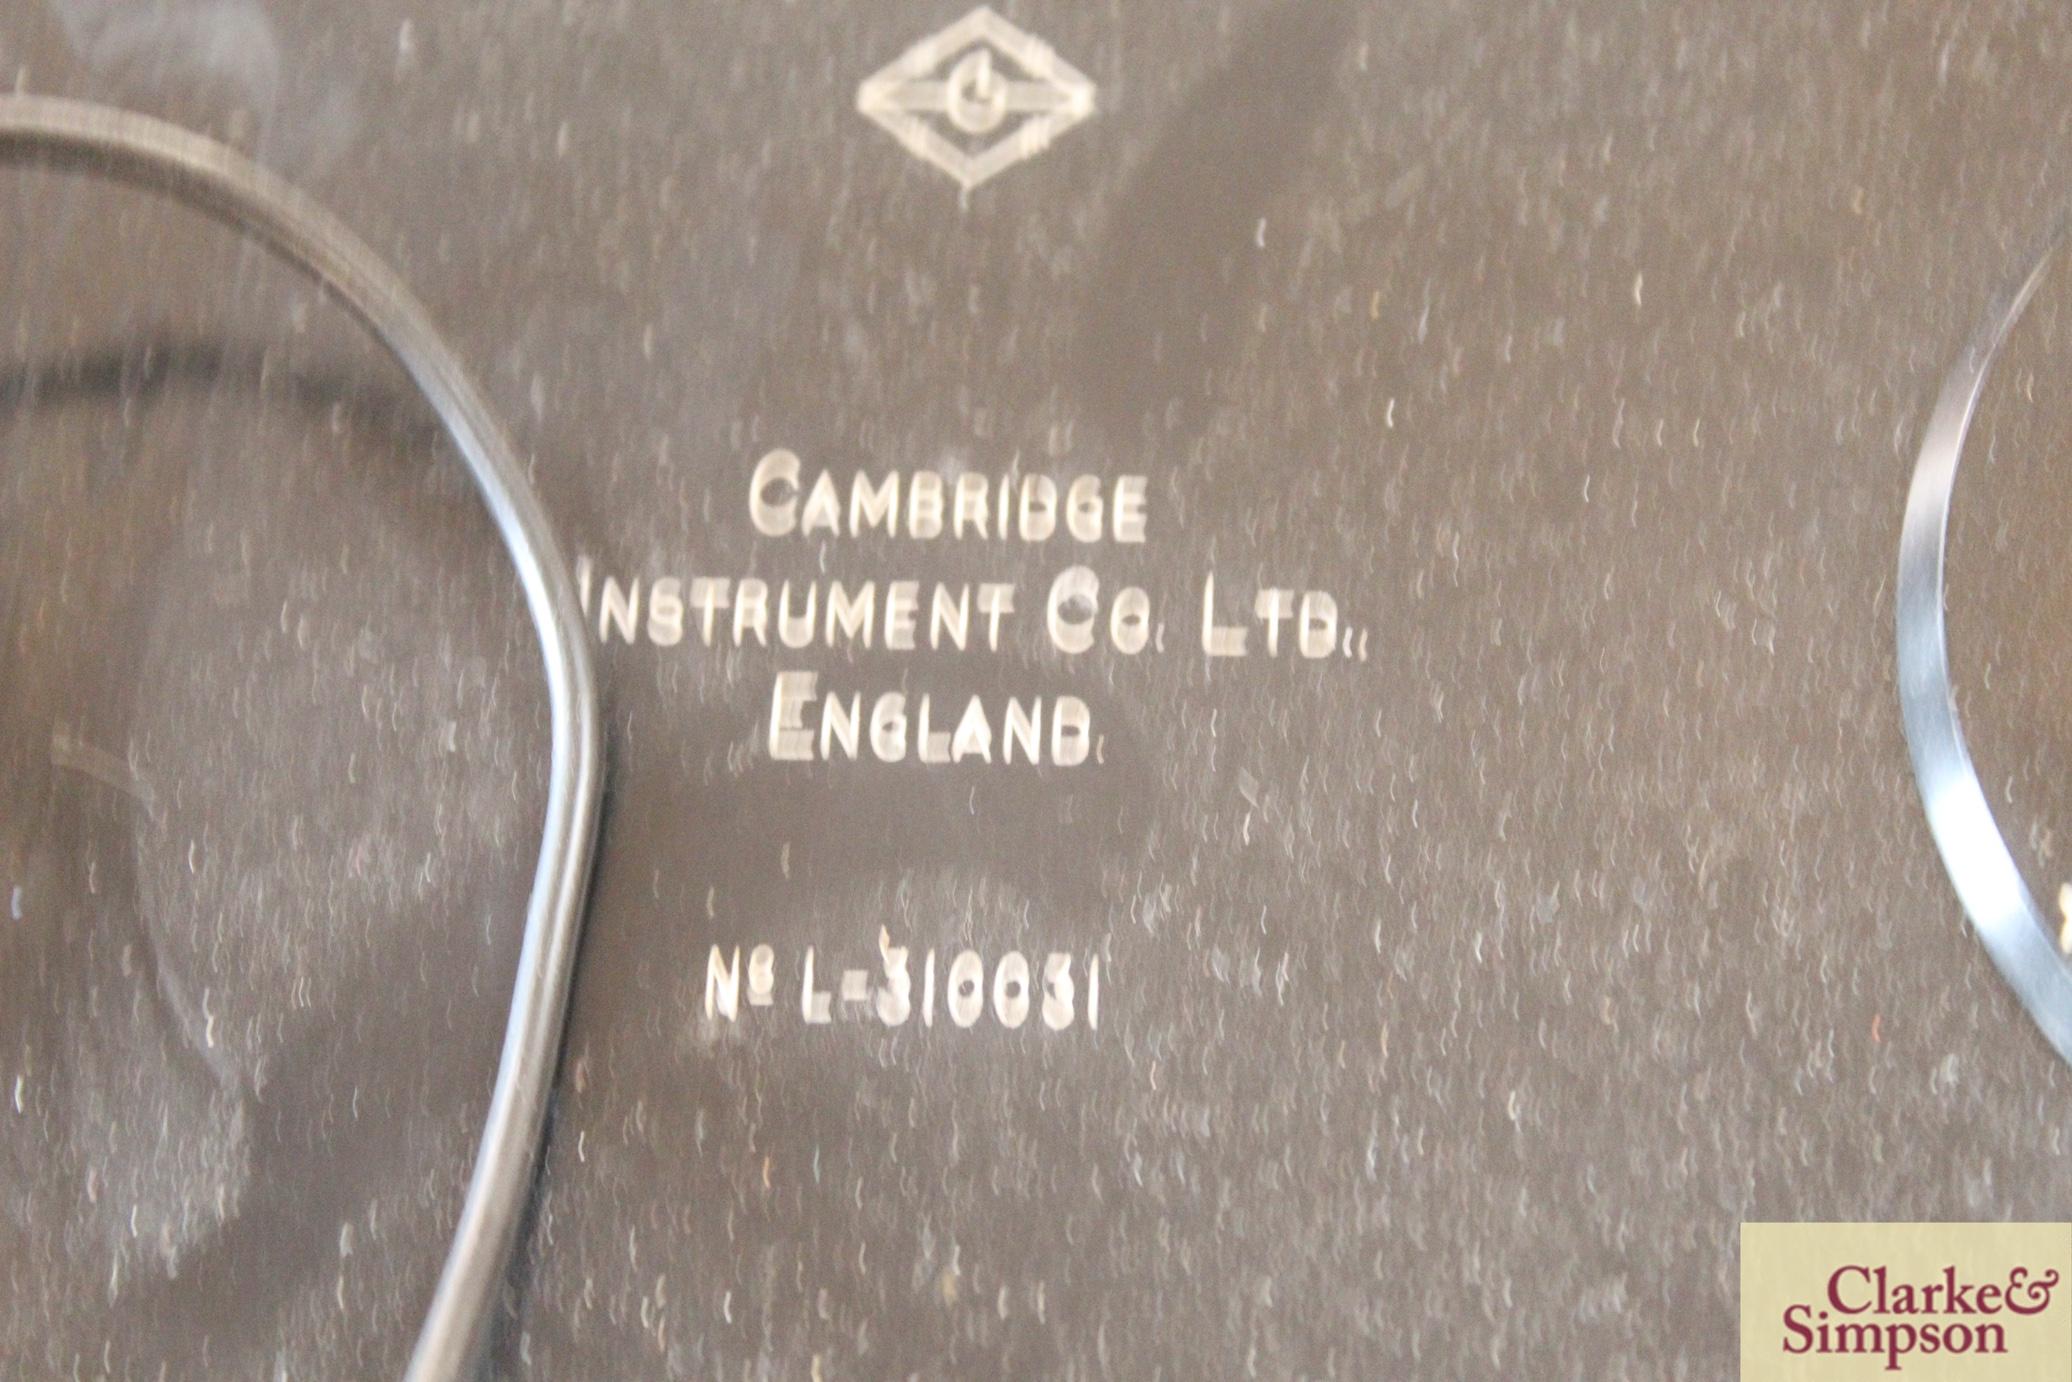 A Cambridge Decade Bridge No.L-310031 electrical tester - Image 6 of 6